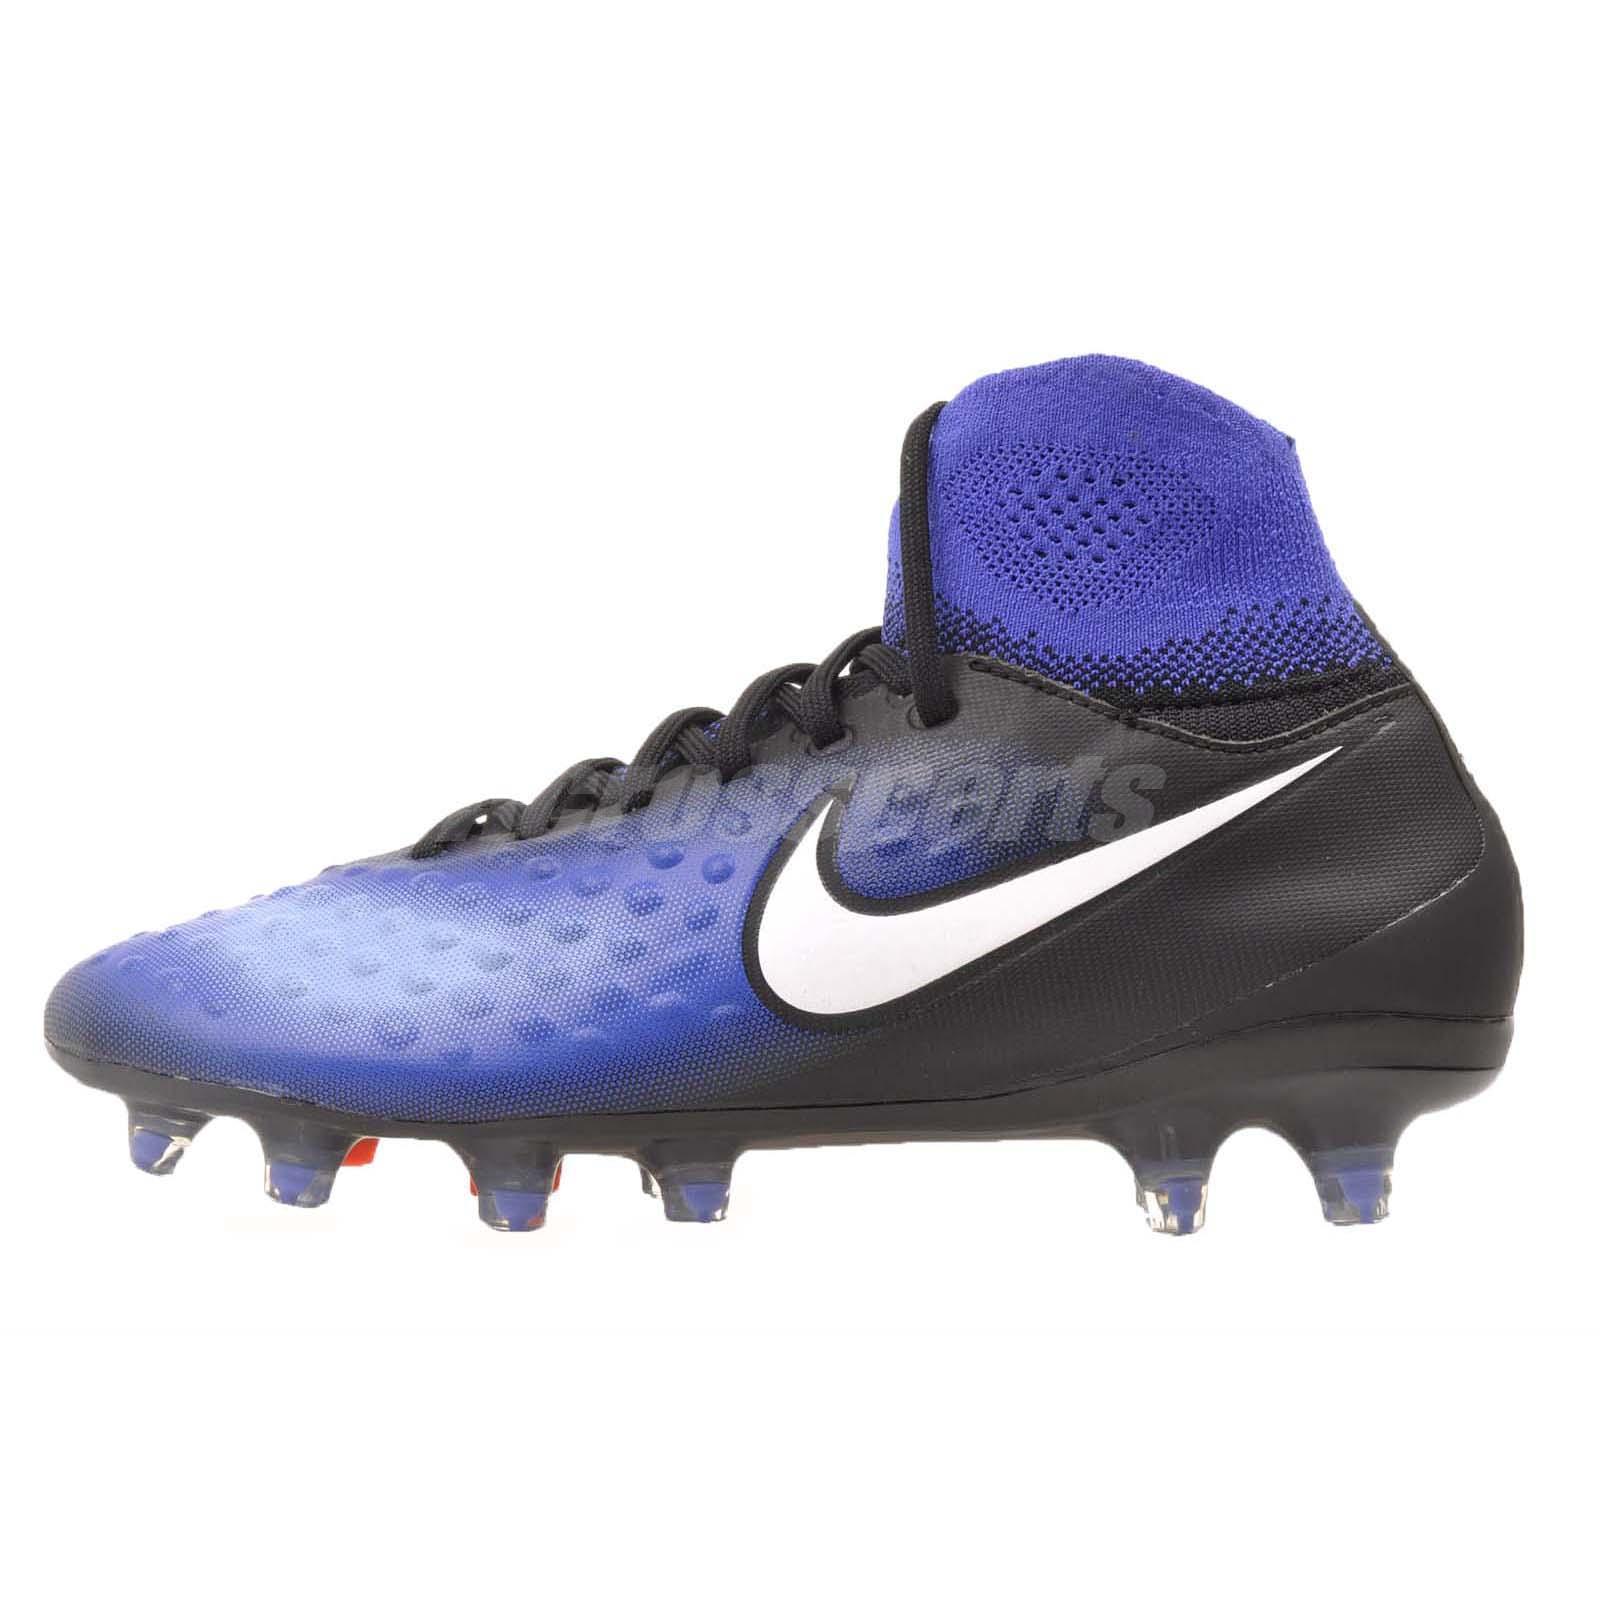 e1591e30e Nike JR Magista Obra II FG Kids Boys Girls Soccer Cleats Black Blue  844410-015